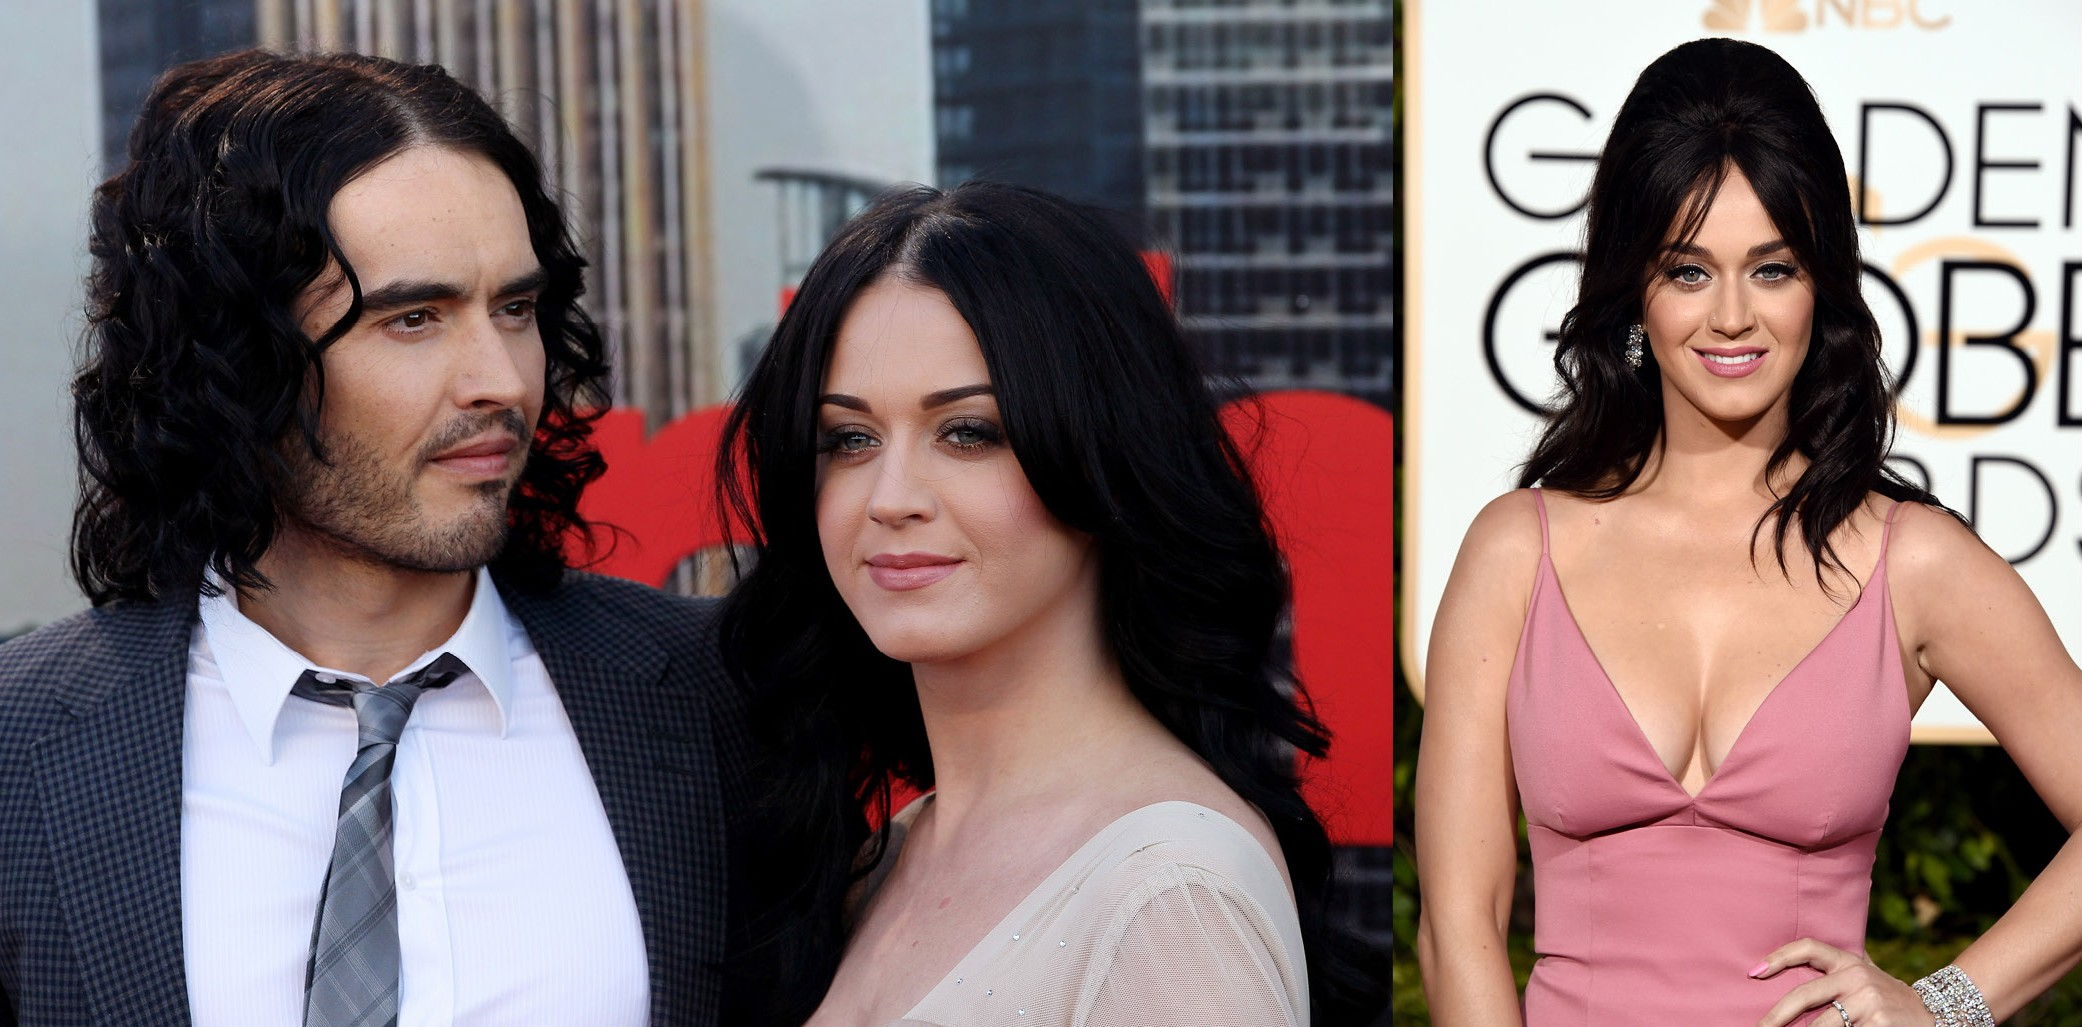 Katy Perry e Russell Brand em 2011. E Katy Perry em 2016 (Foto: Getty Images)